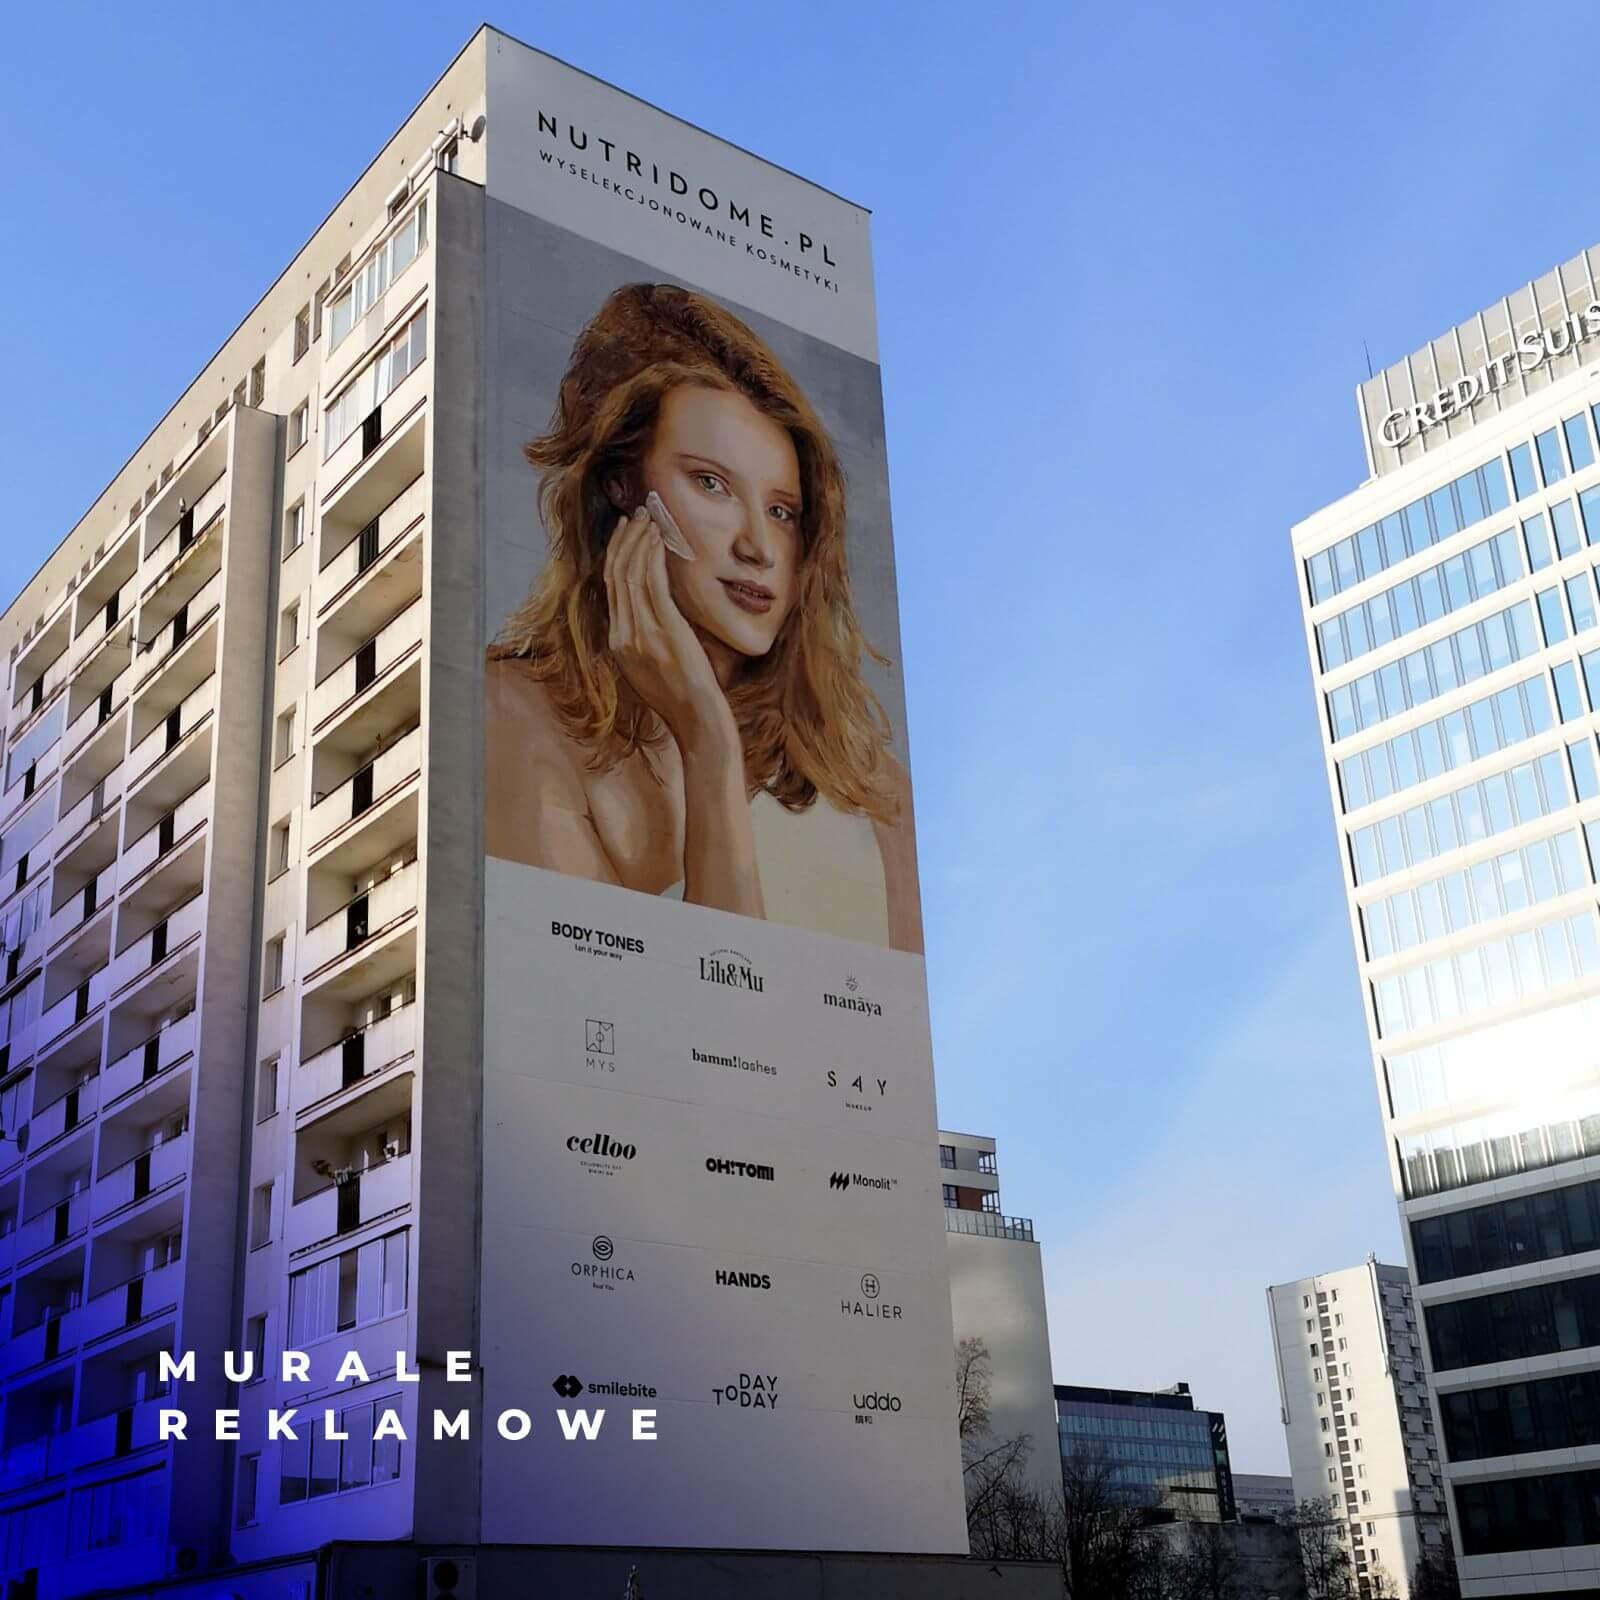 murale reklamowe